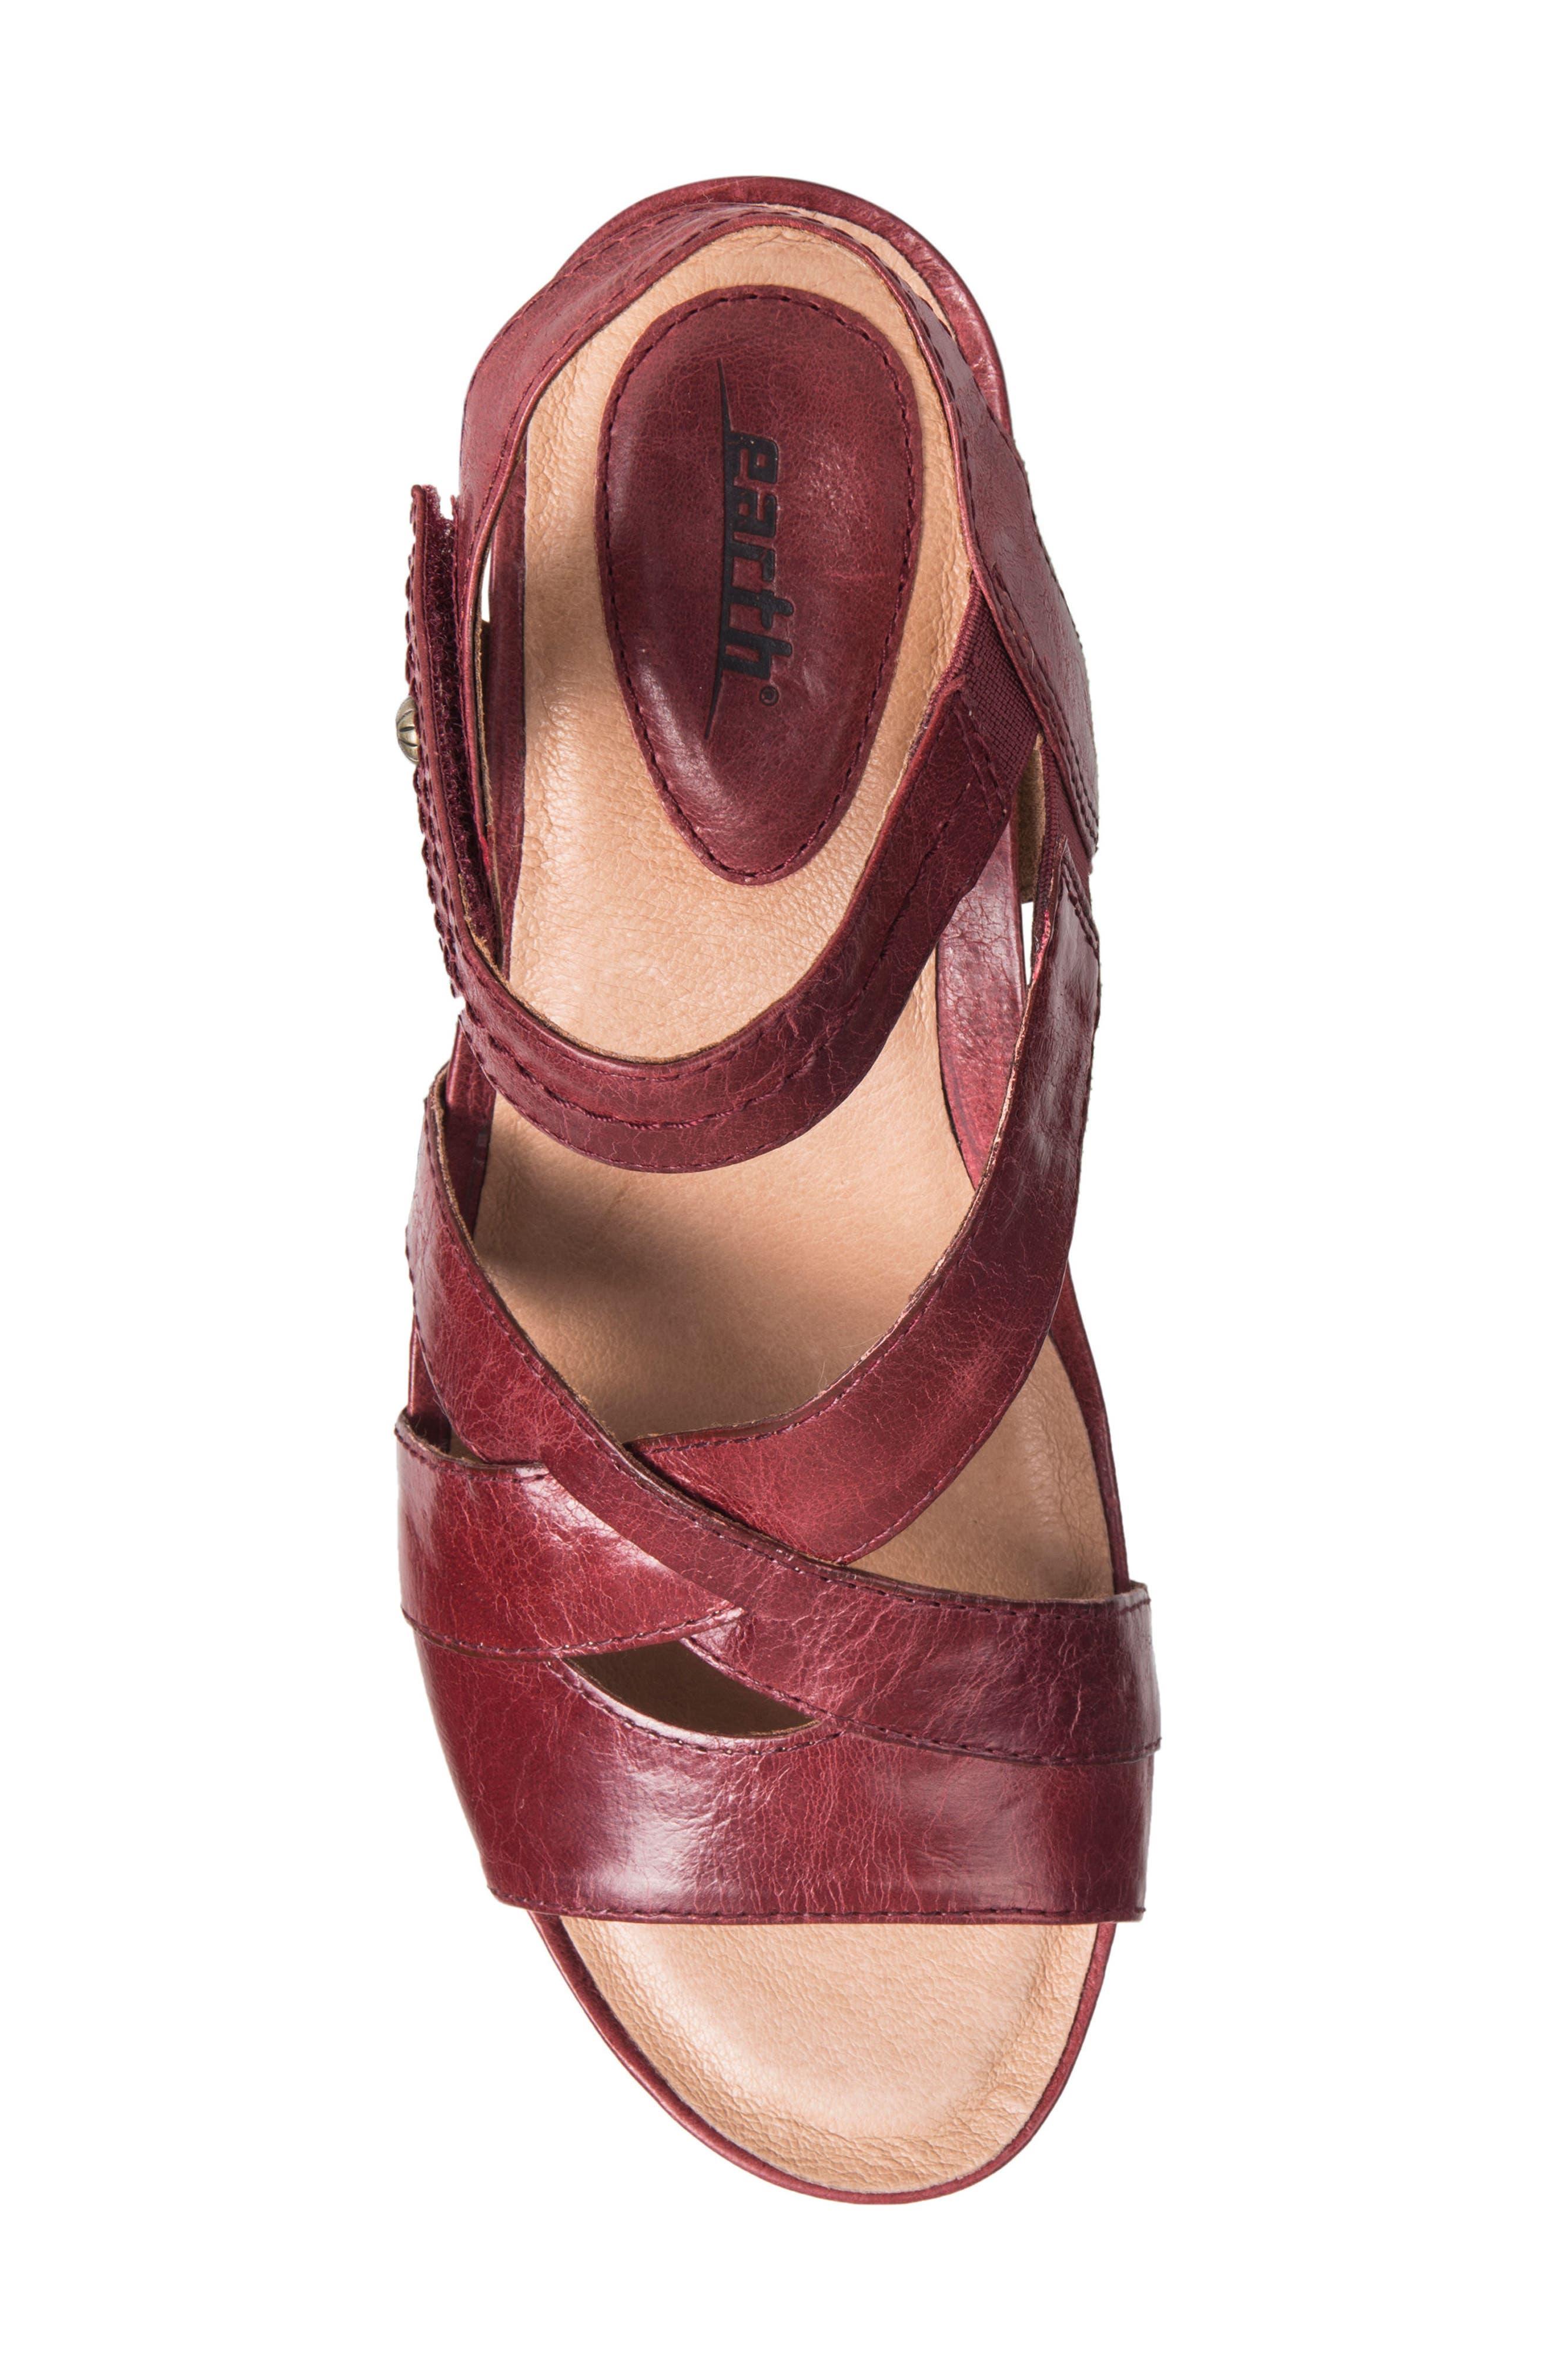 Thistle Wedge Sandal,                             Alternate thumbnail 19, color,